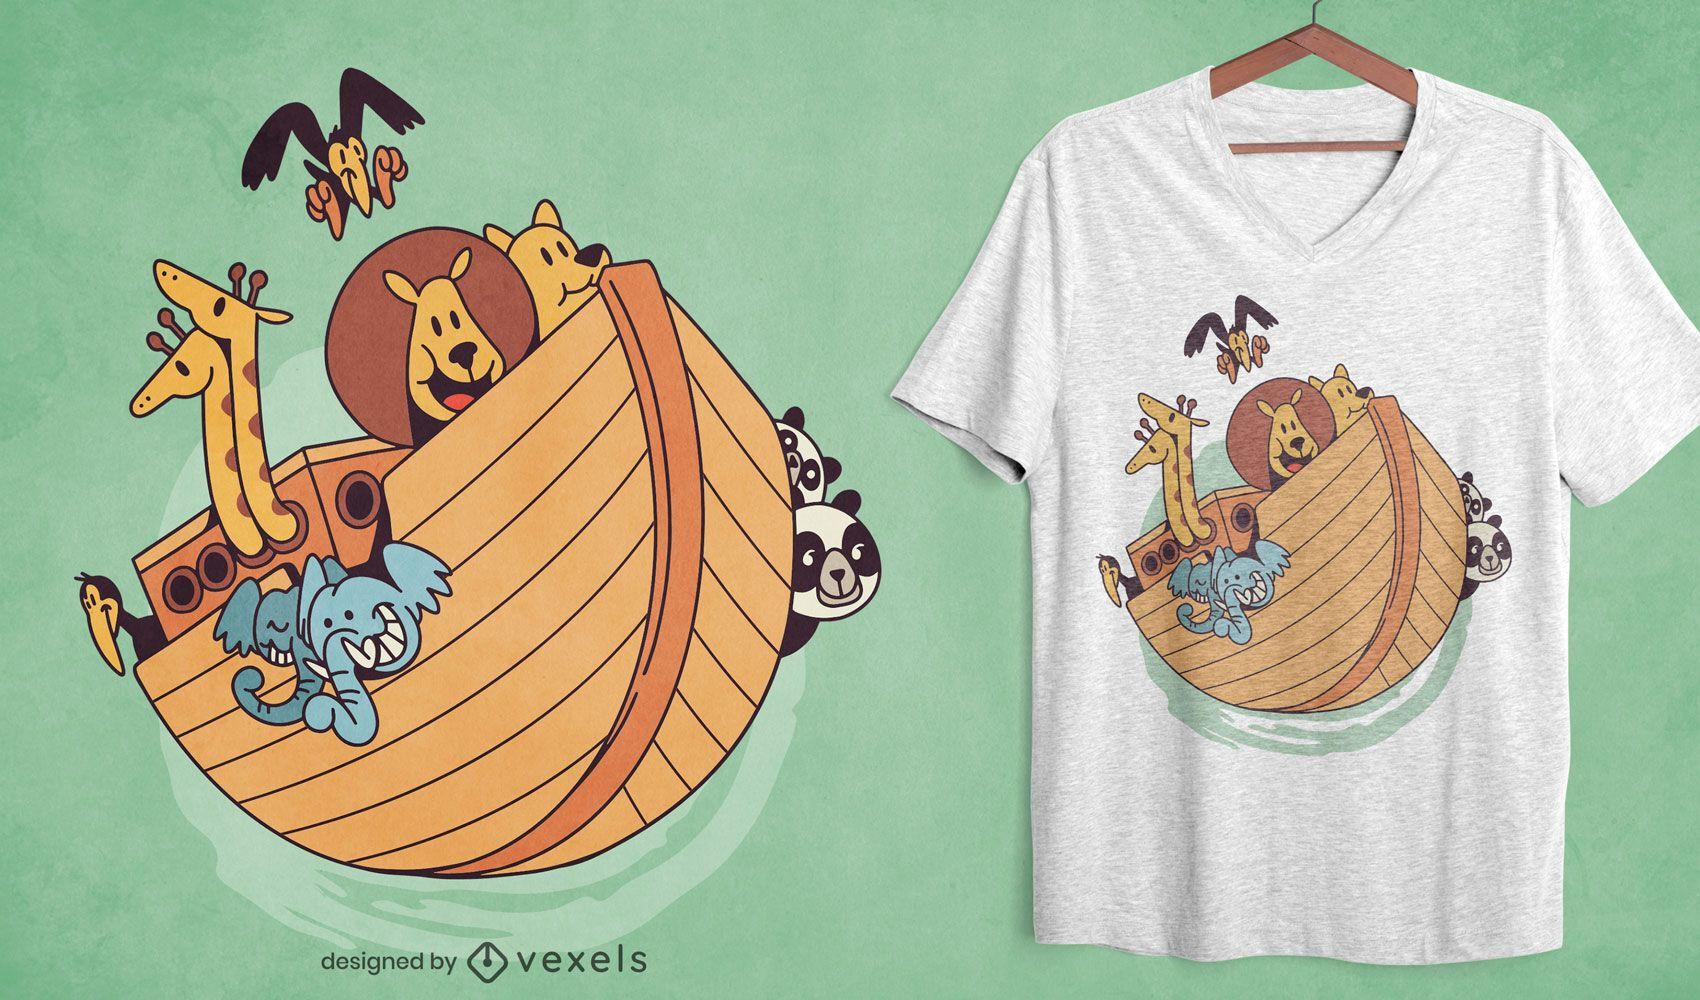 Noah's ark t-shirt design